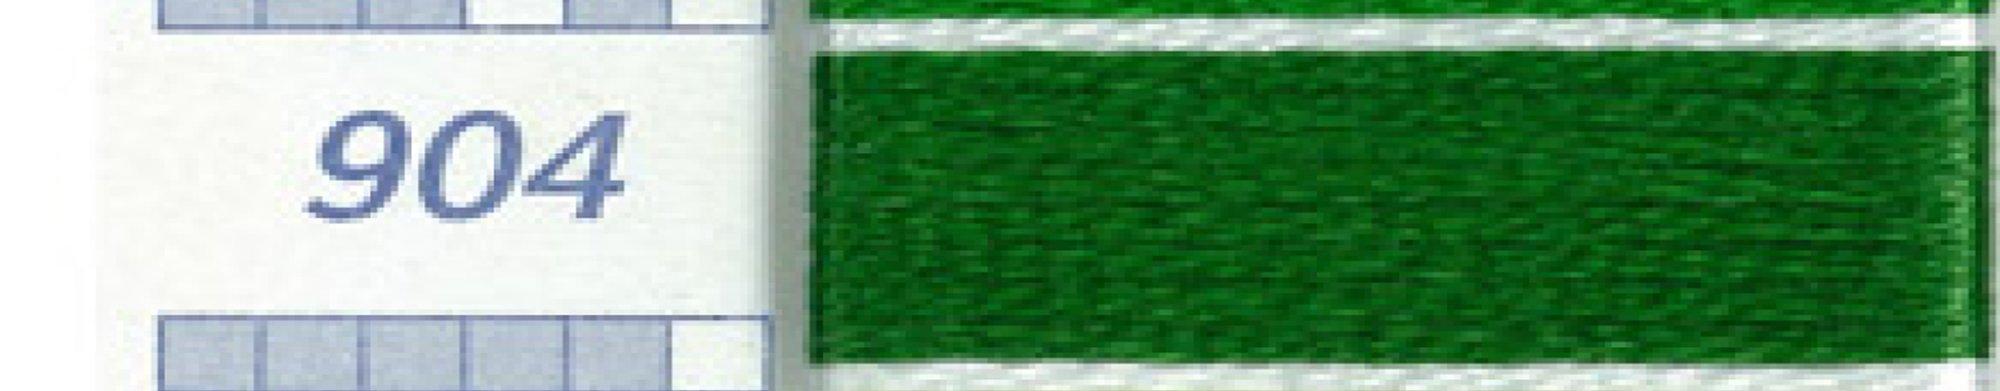 DP3-904-V DK PARROT GREEN